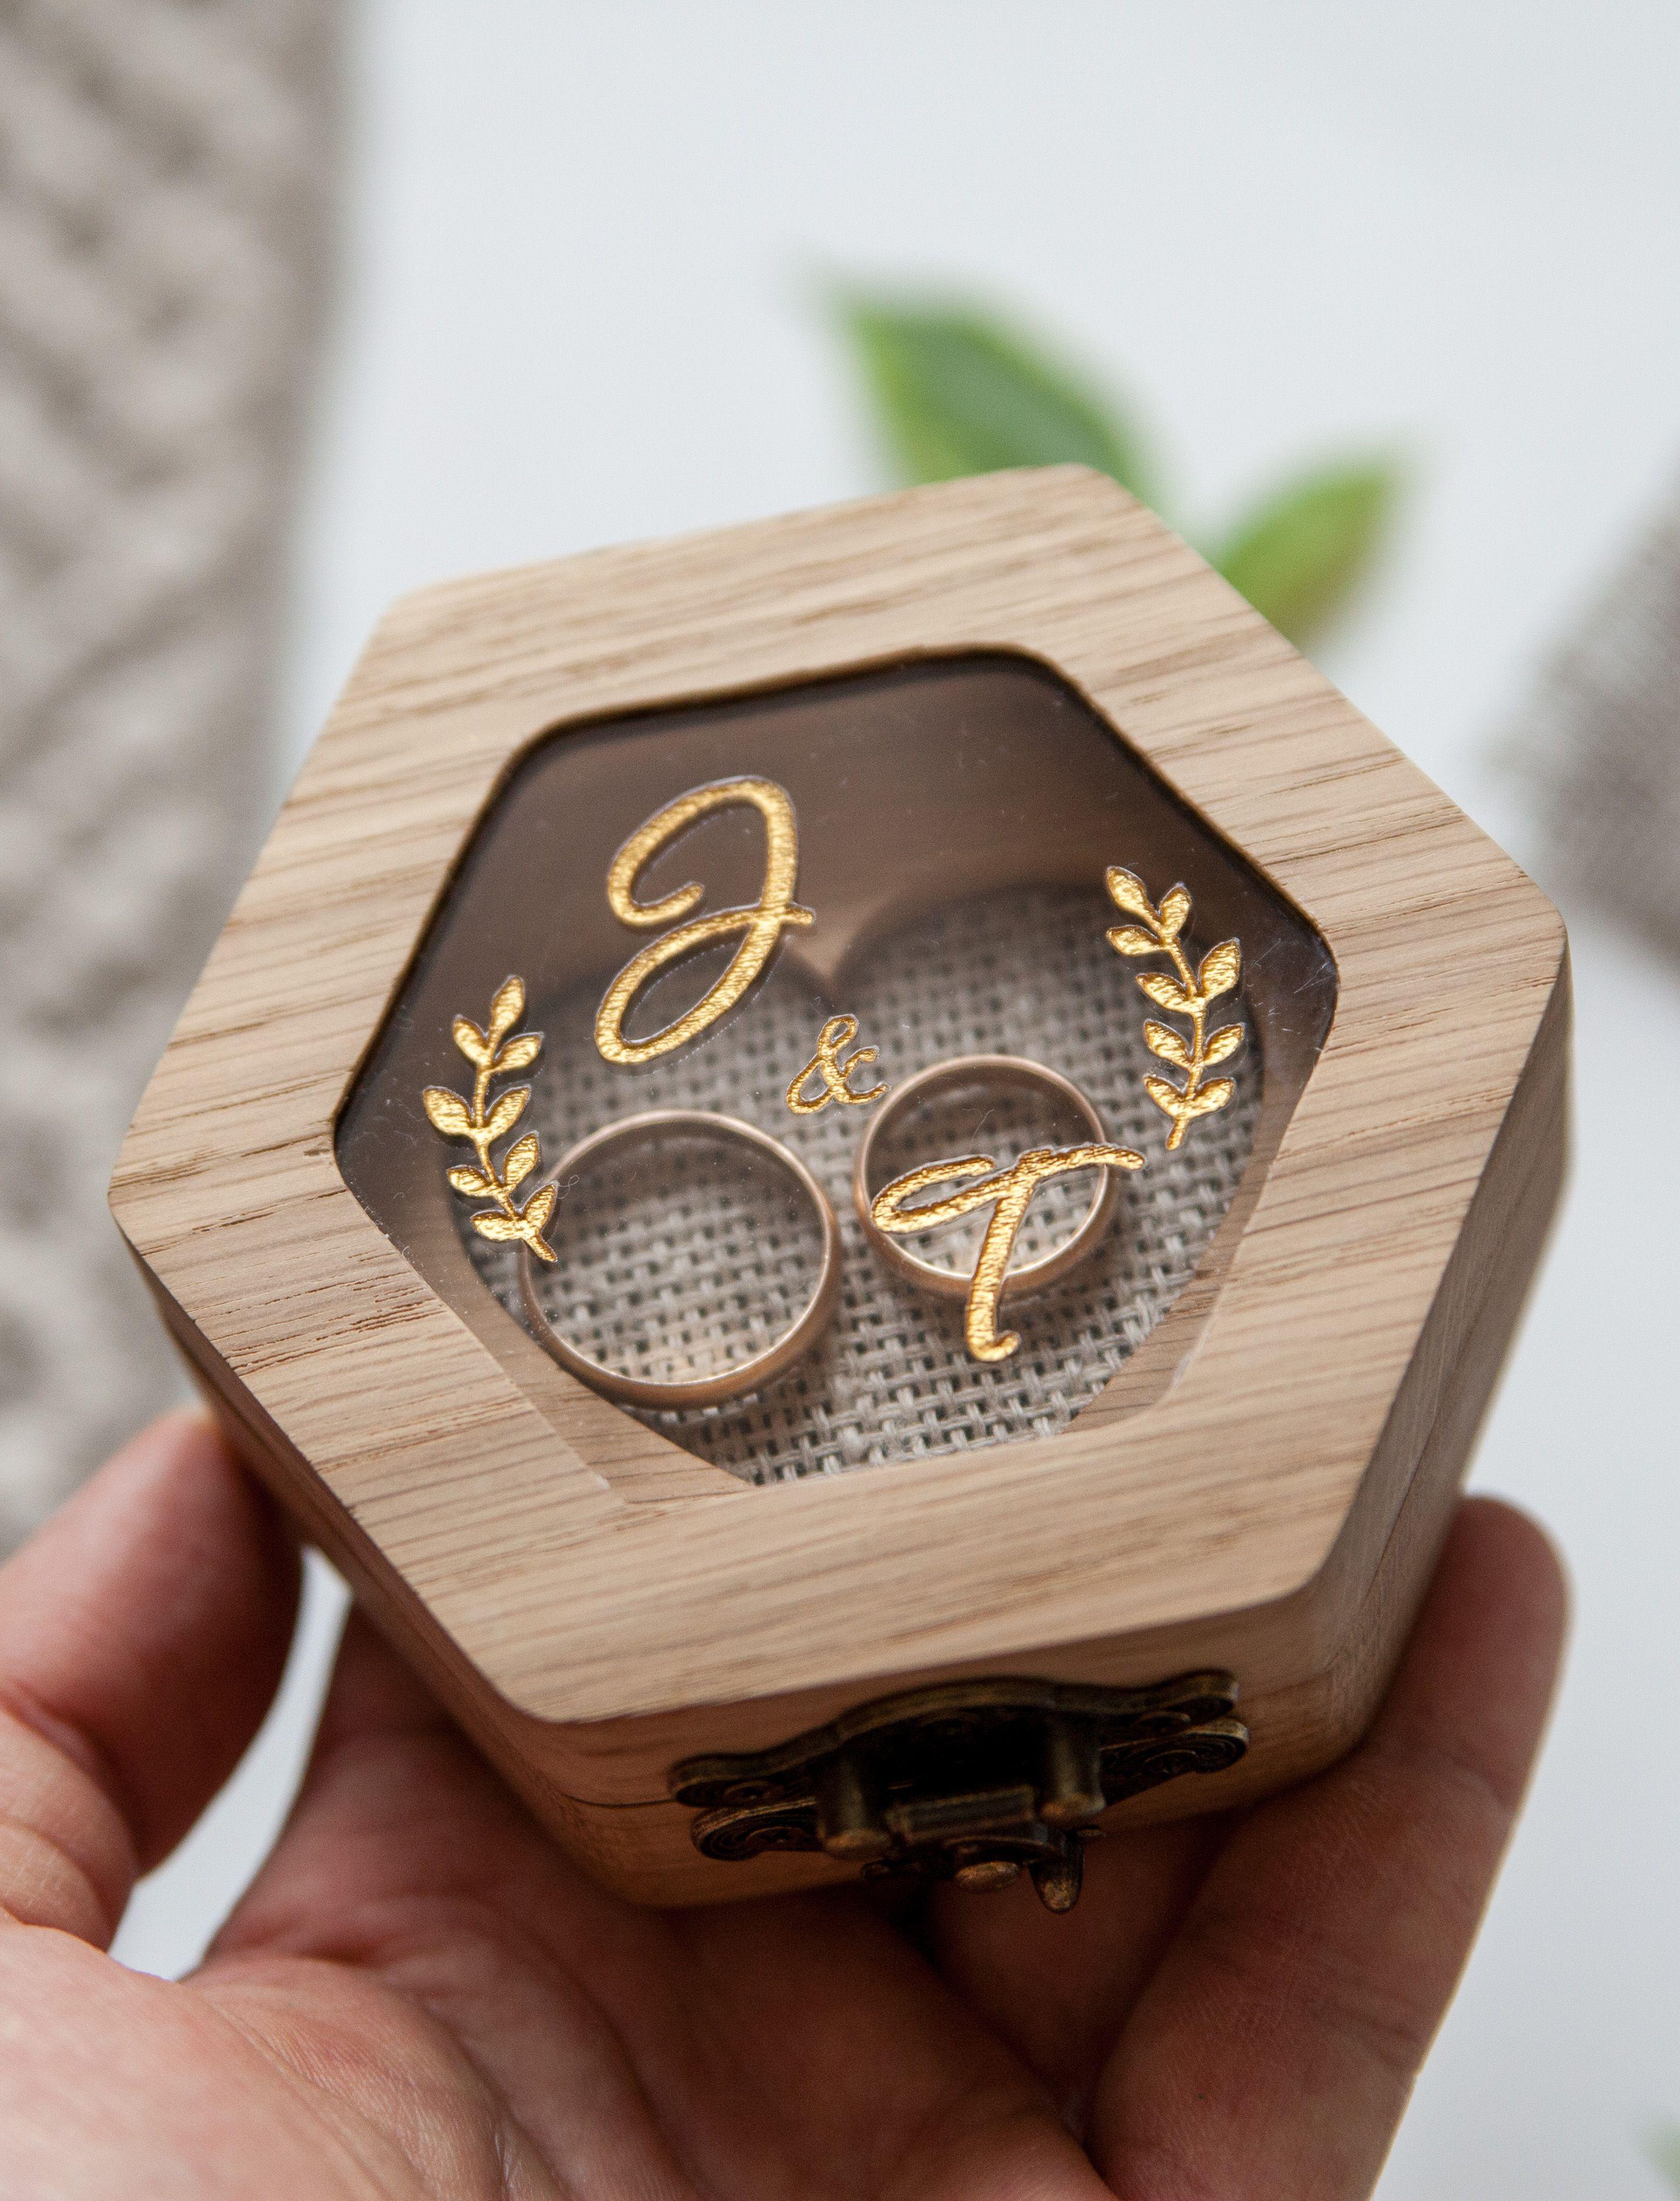 Engraved Ring Box Wedding Rings Box Engraved Wedding Ring Box Ring Bearer Box Engagement Ring Holder Customized Wedding Ring Box